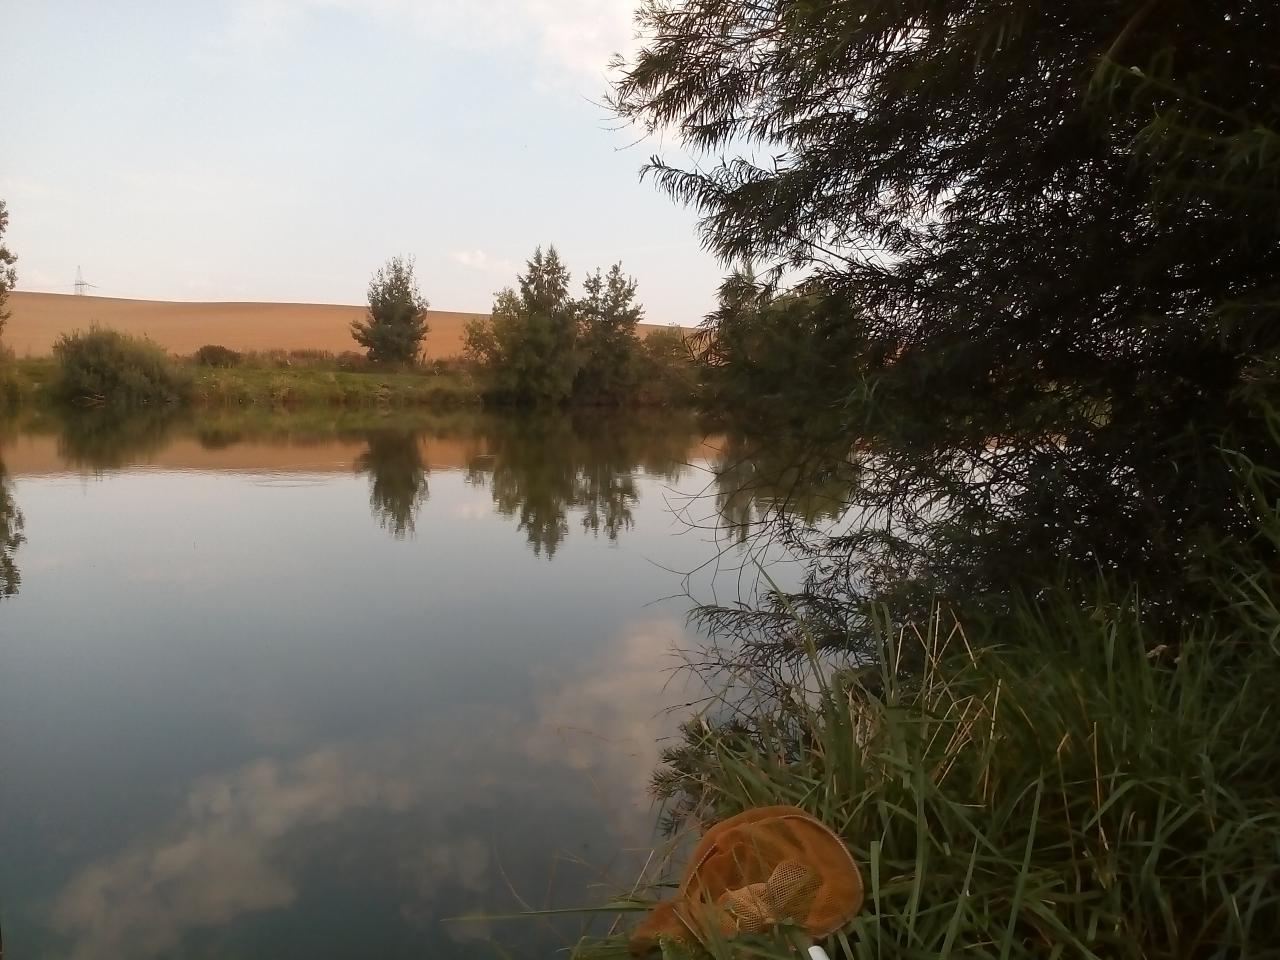 Вчера решил вечер провести на Ярково. Остатки перловки ... | Отчеты о рыбалке в Беларуси